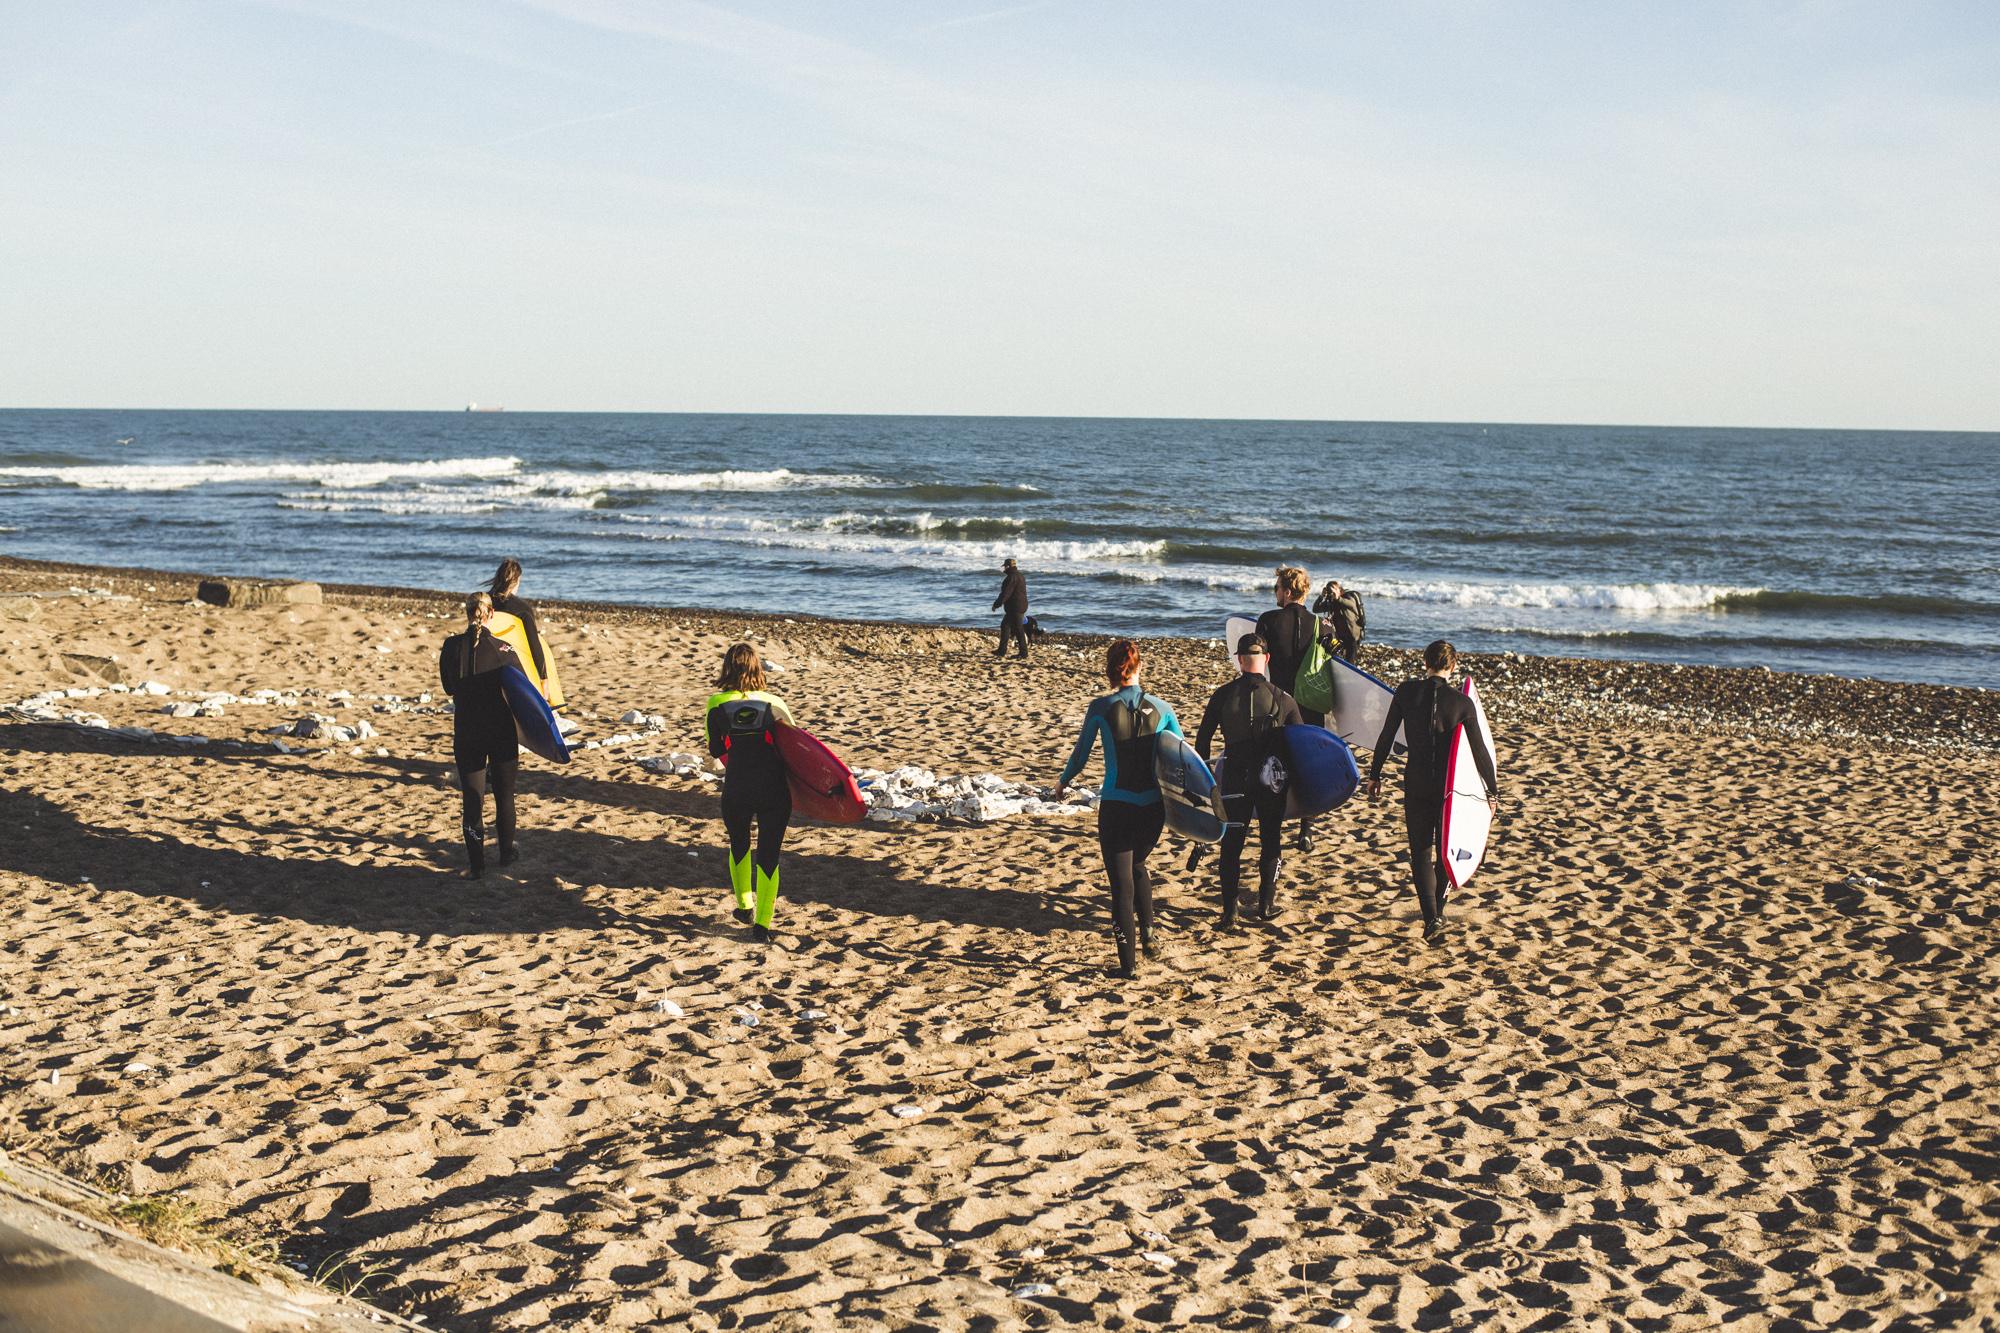 Surfkurs 7:30 Uhr - Der frühe Vogel bekommt die beste Welle